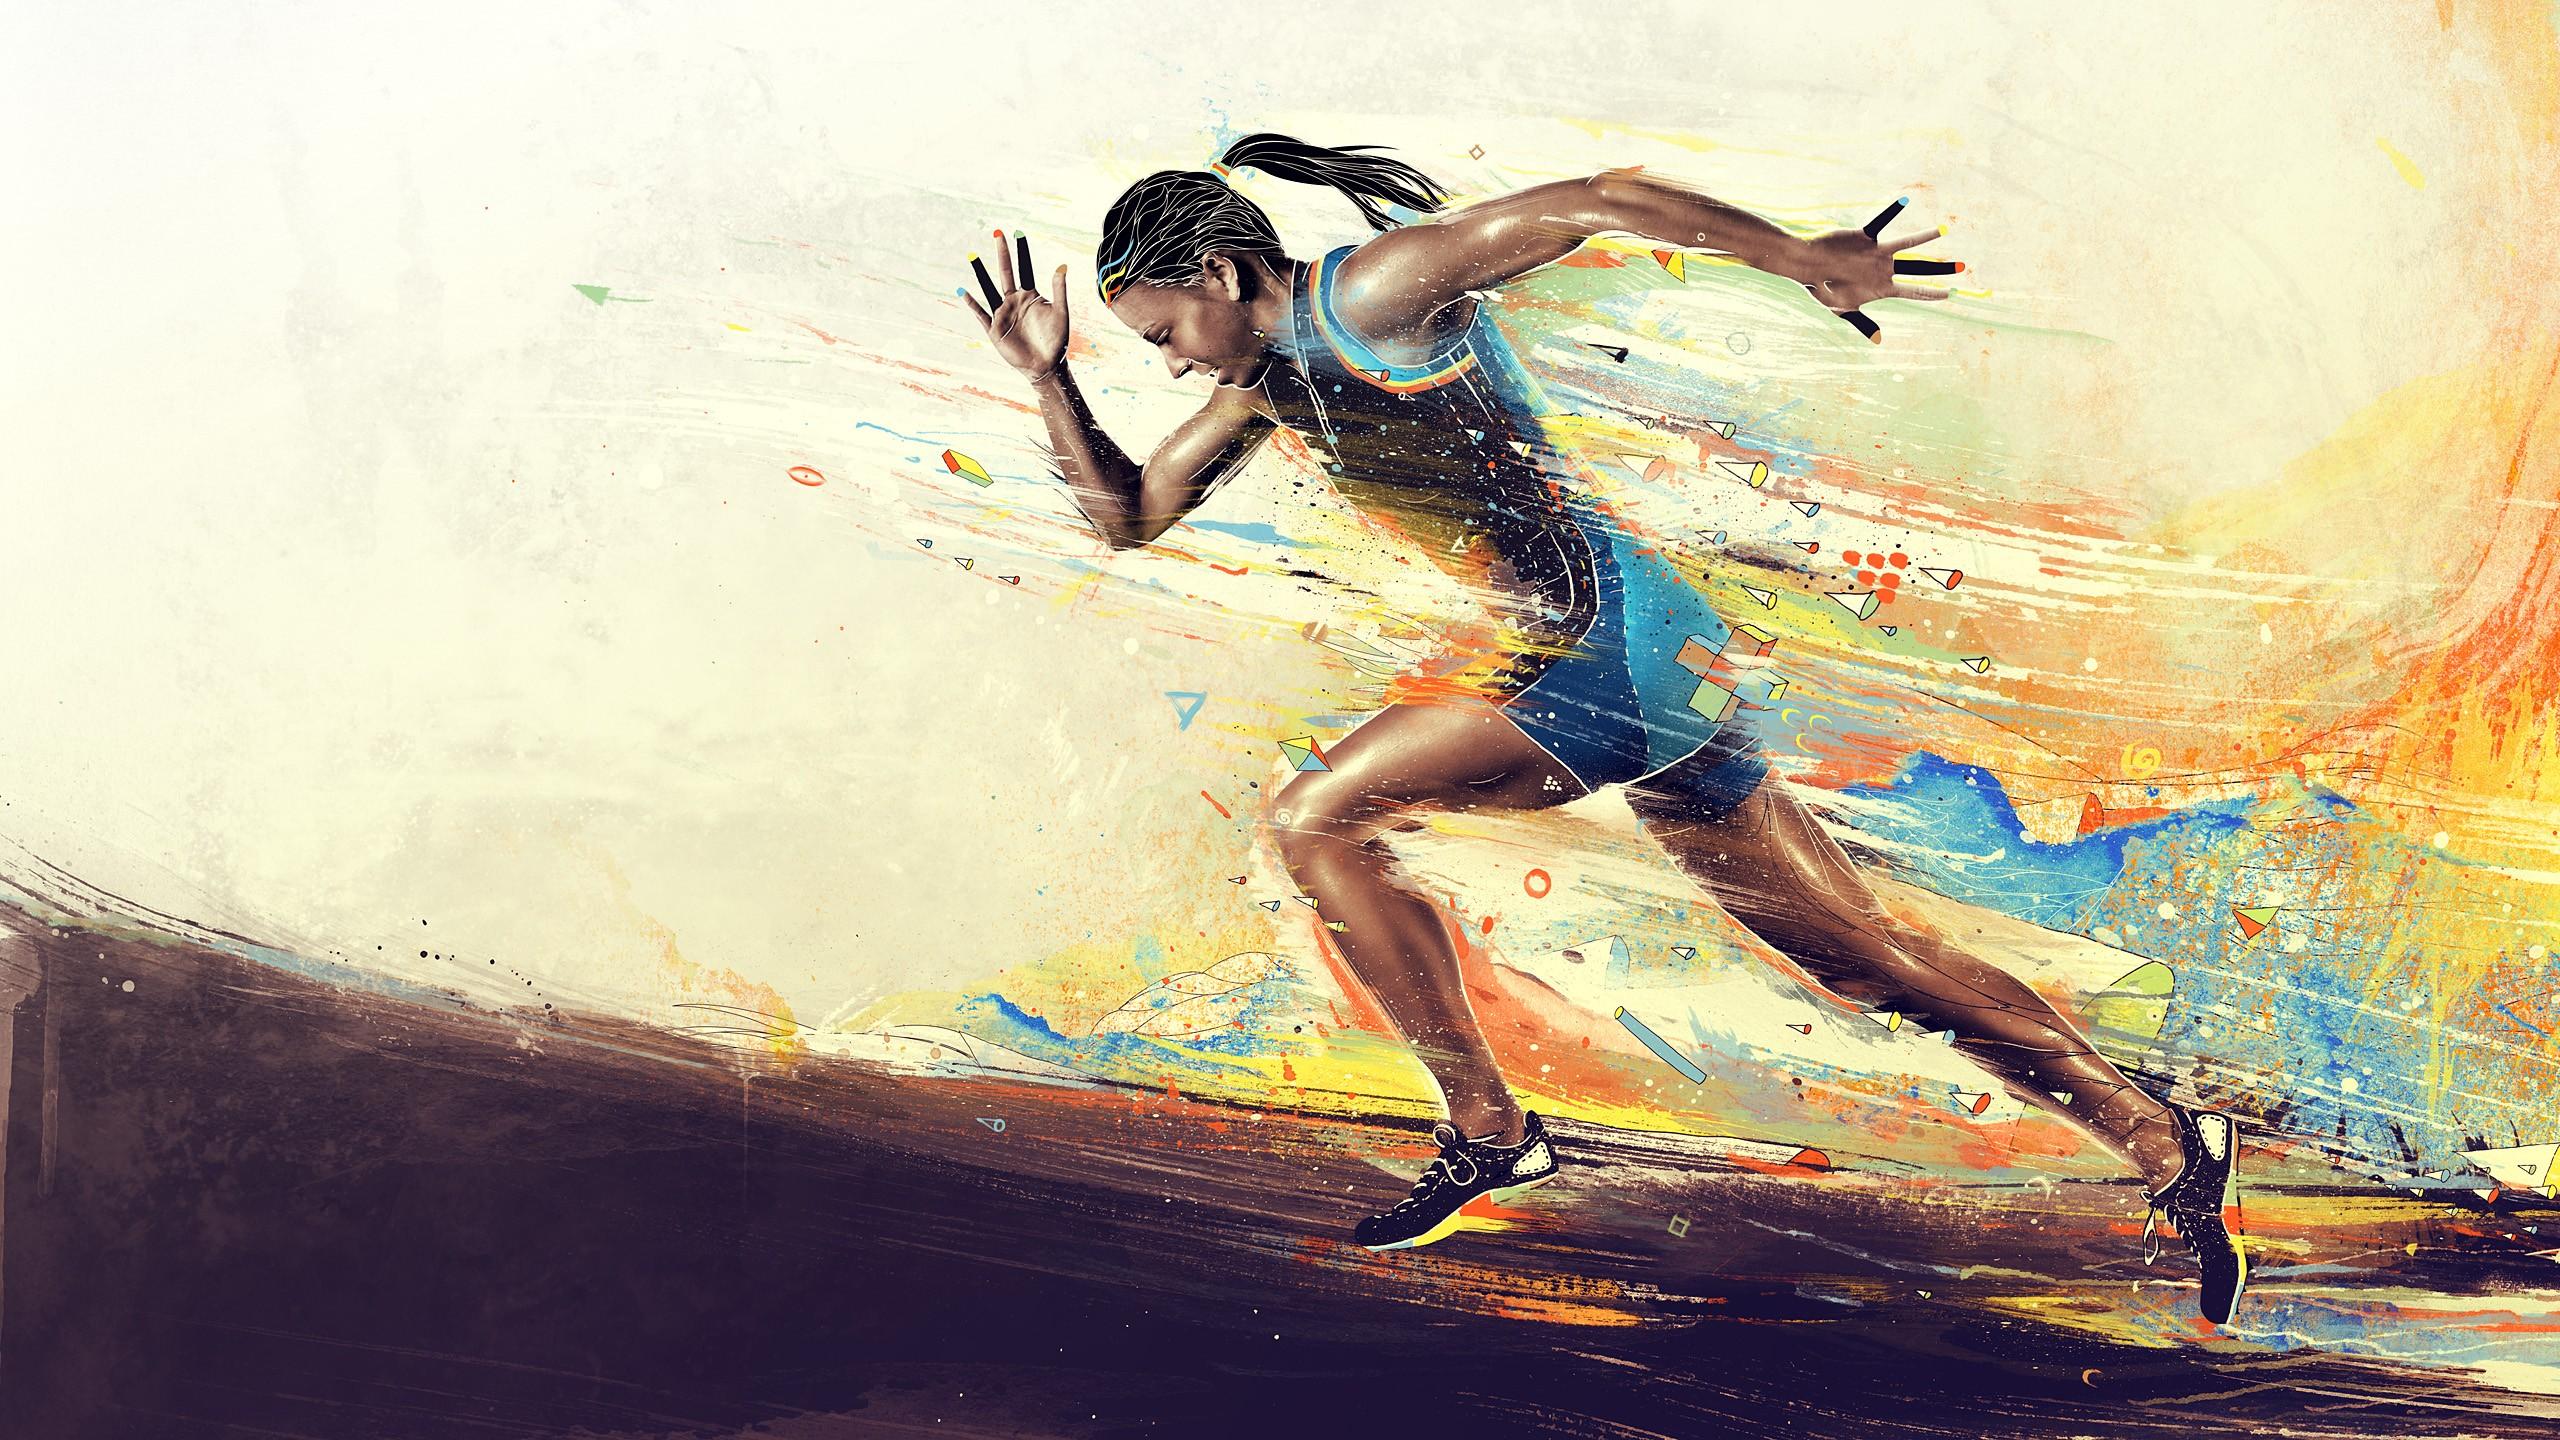 Marathon Running Wallpaper Running Girl Wallpaper 2560x1440